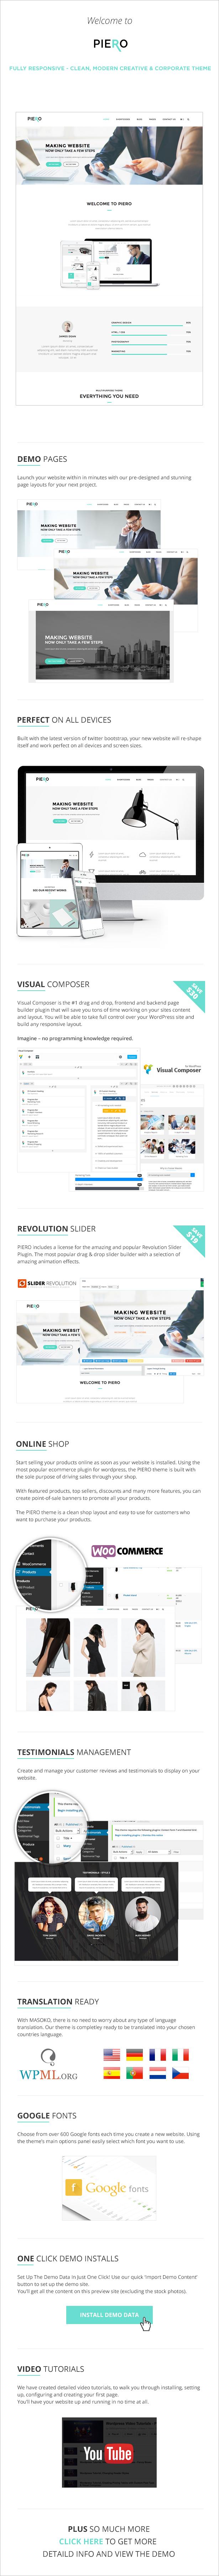 PIERO | Clean, Modern, Multi-Use Wordpress Theme - 3